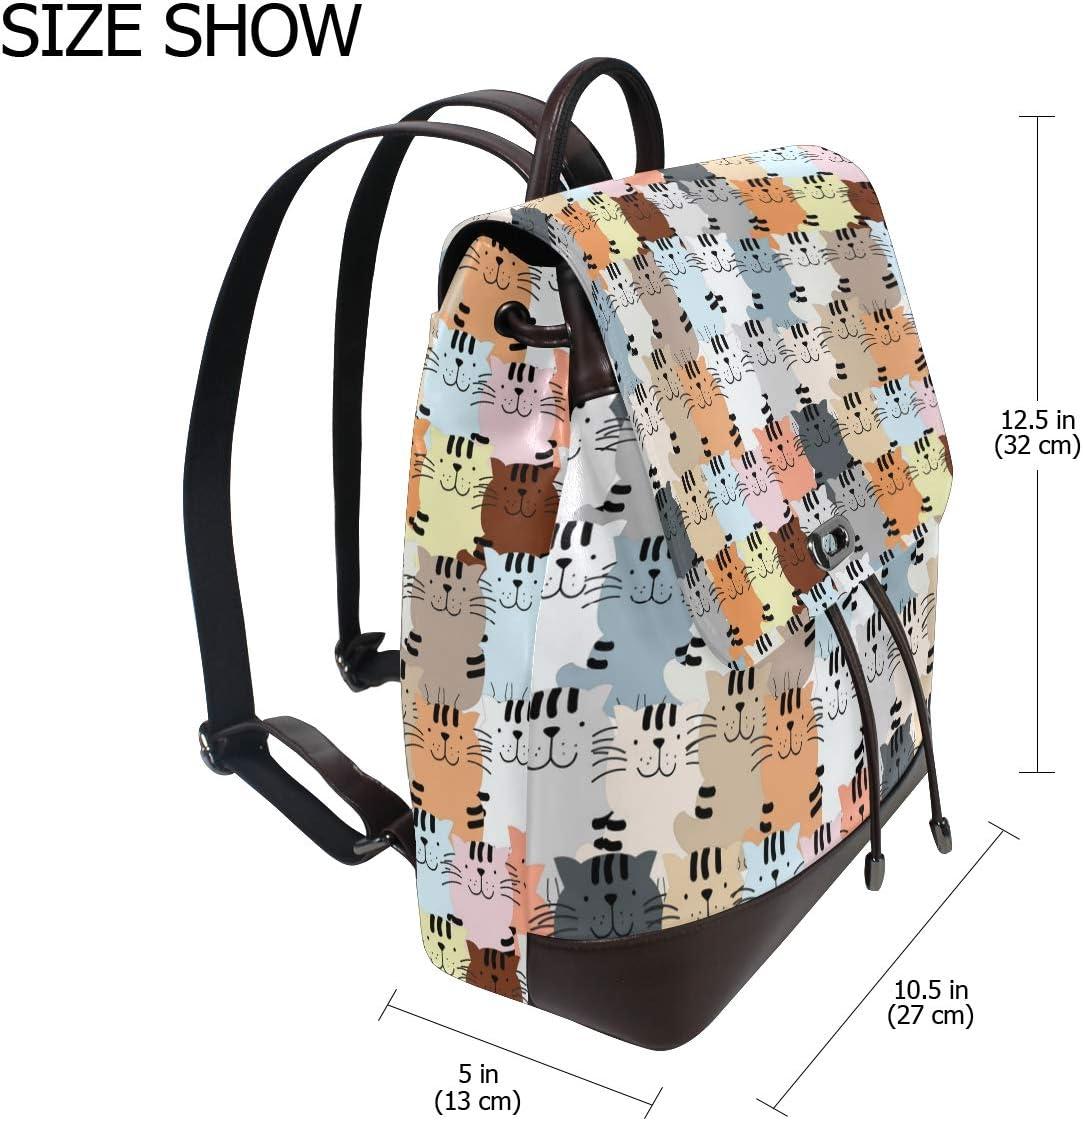 Unisex PU Leather Backpack Cute Cat Kitty Kitten Cartoon Print Womens Casual Daypack Mens Travel Sports Bag Boys College Bookbag